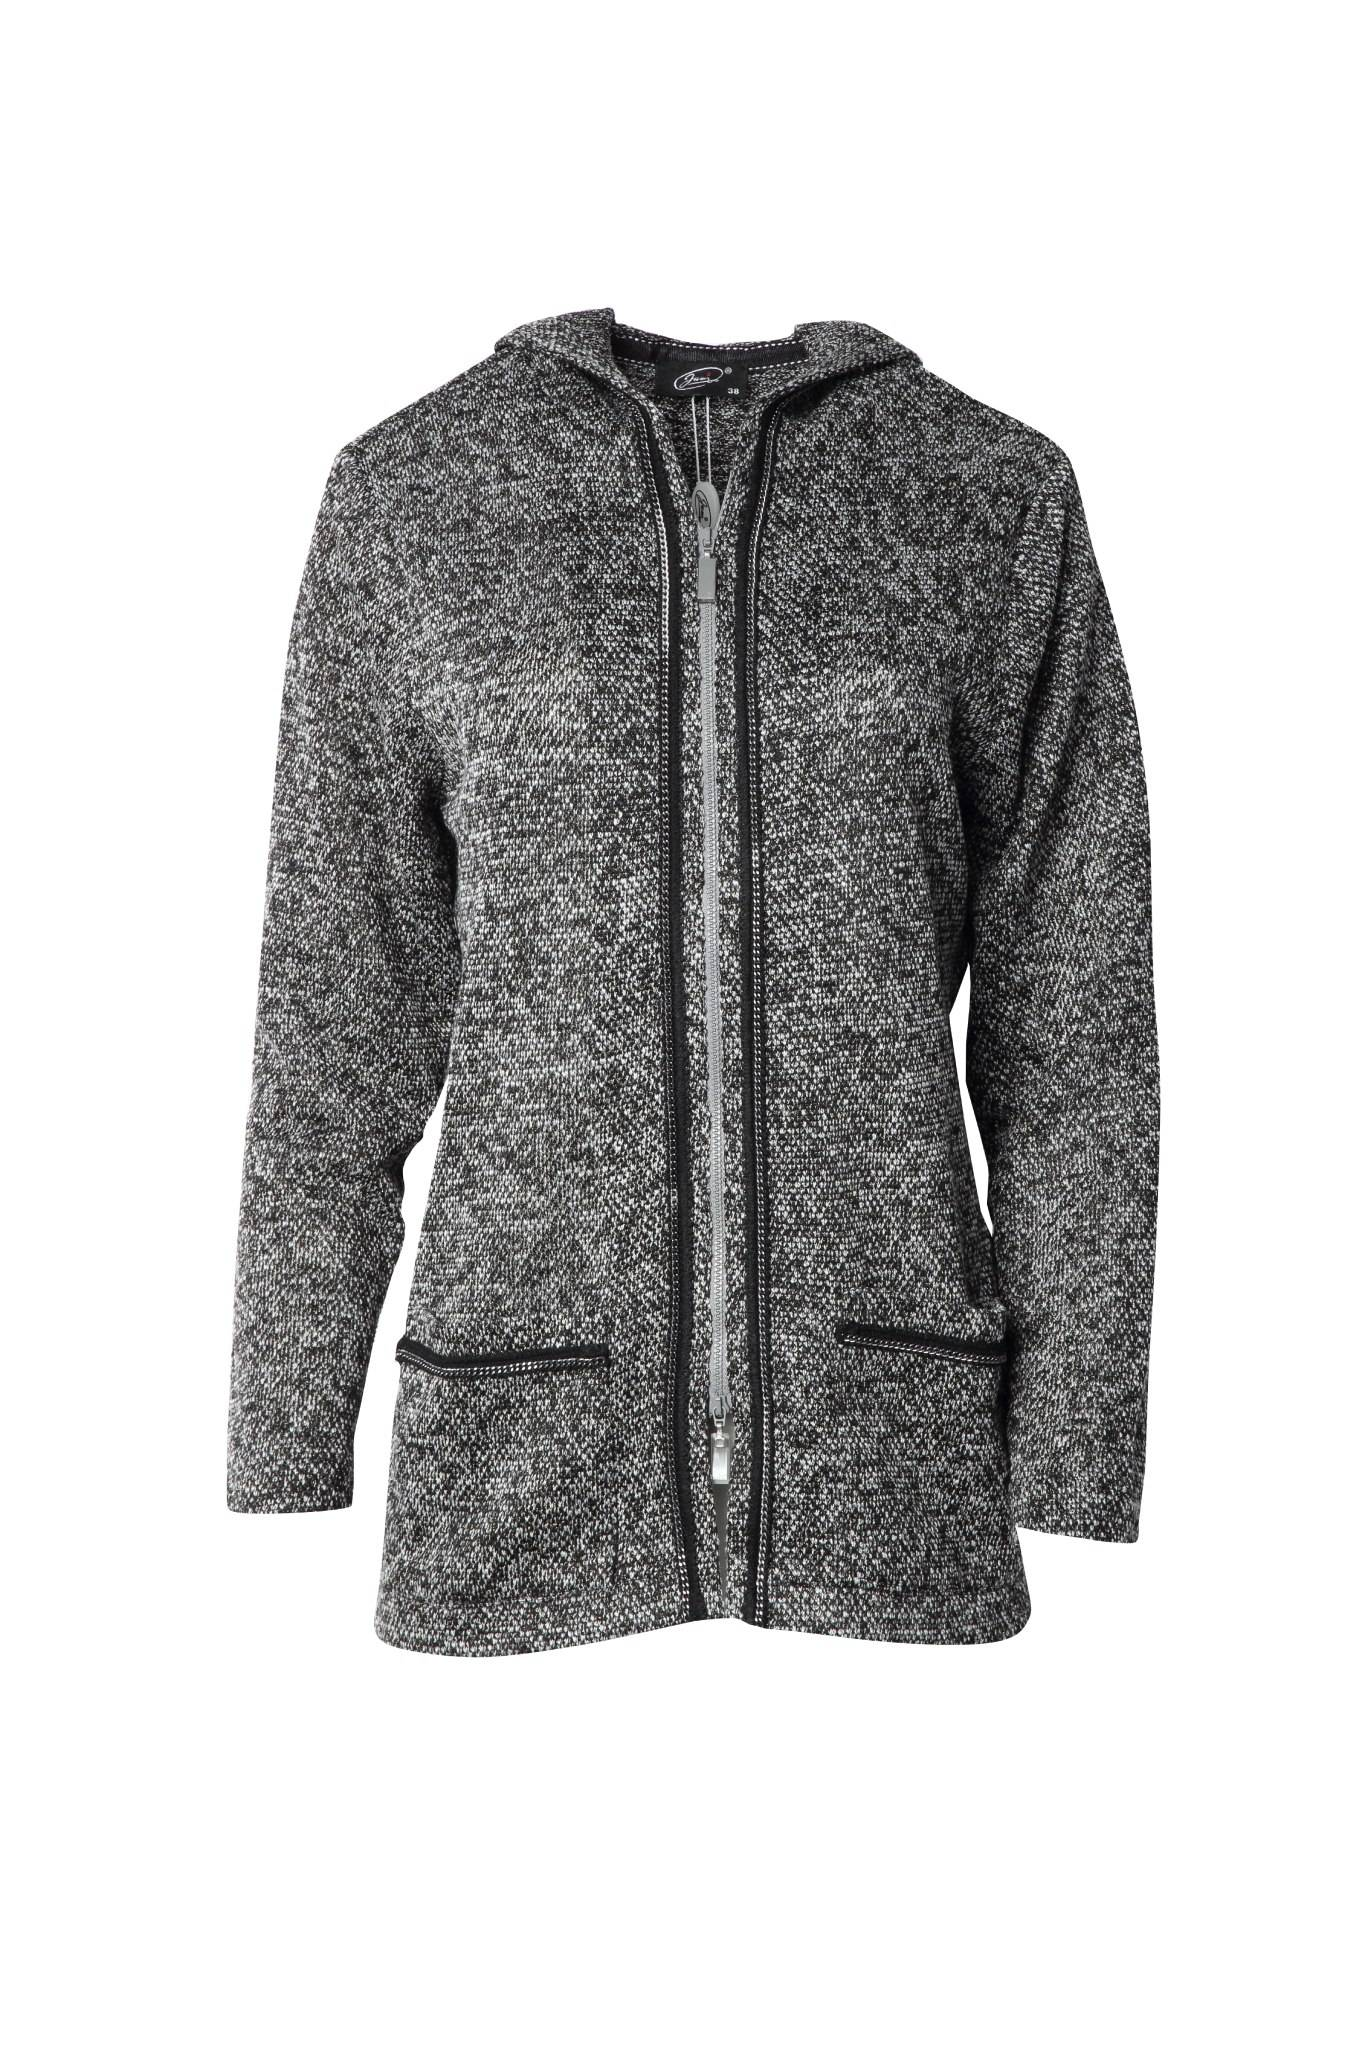 1155 Jumitex sweter z kapturem przod